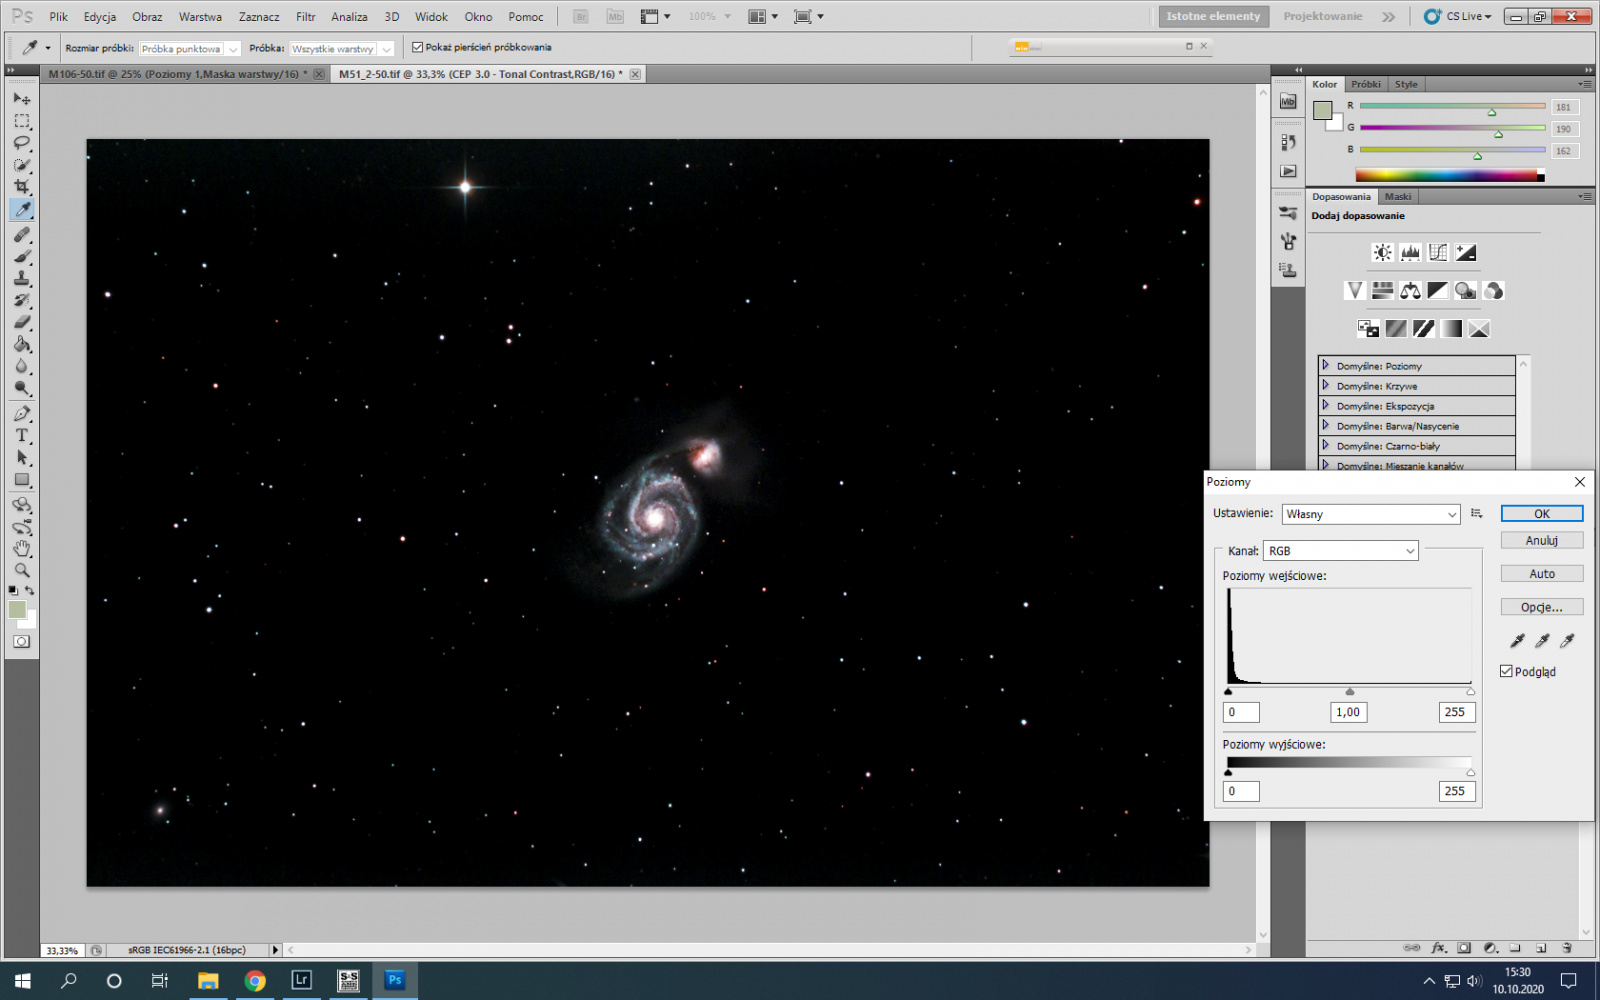 M51hist.jpg